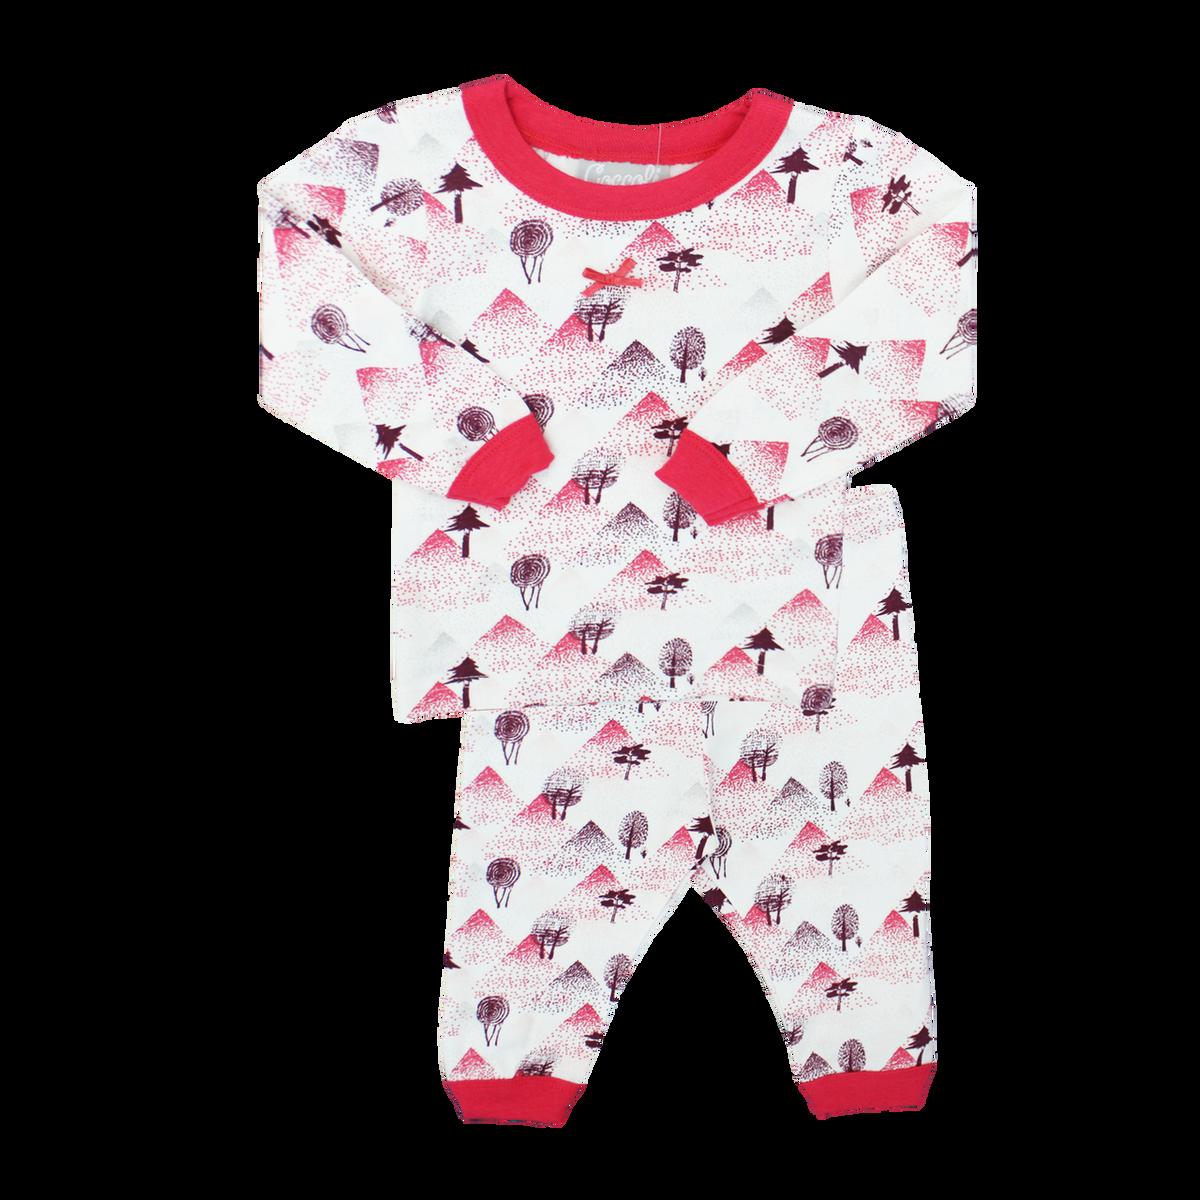 Coccoli Modal | Pyjama | 6 - 24m | ELM4304-159